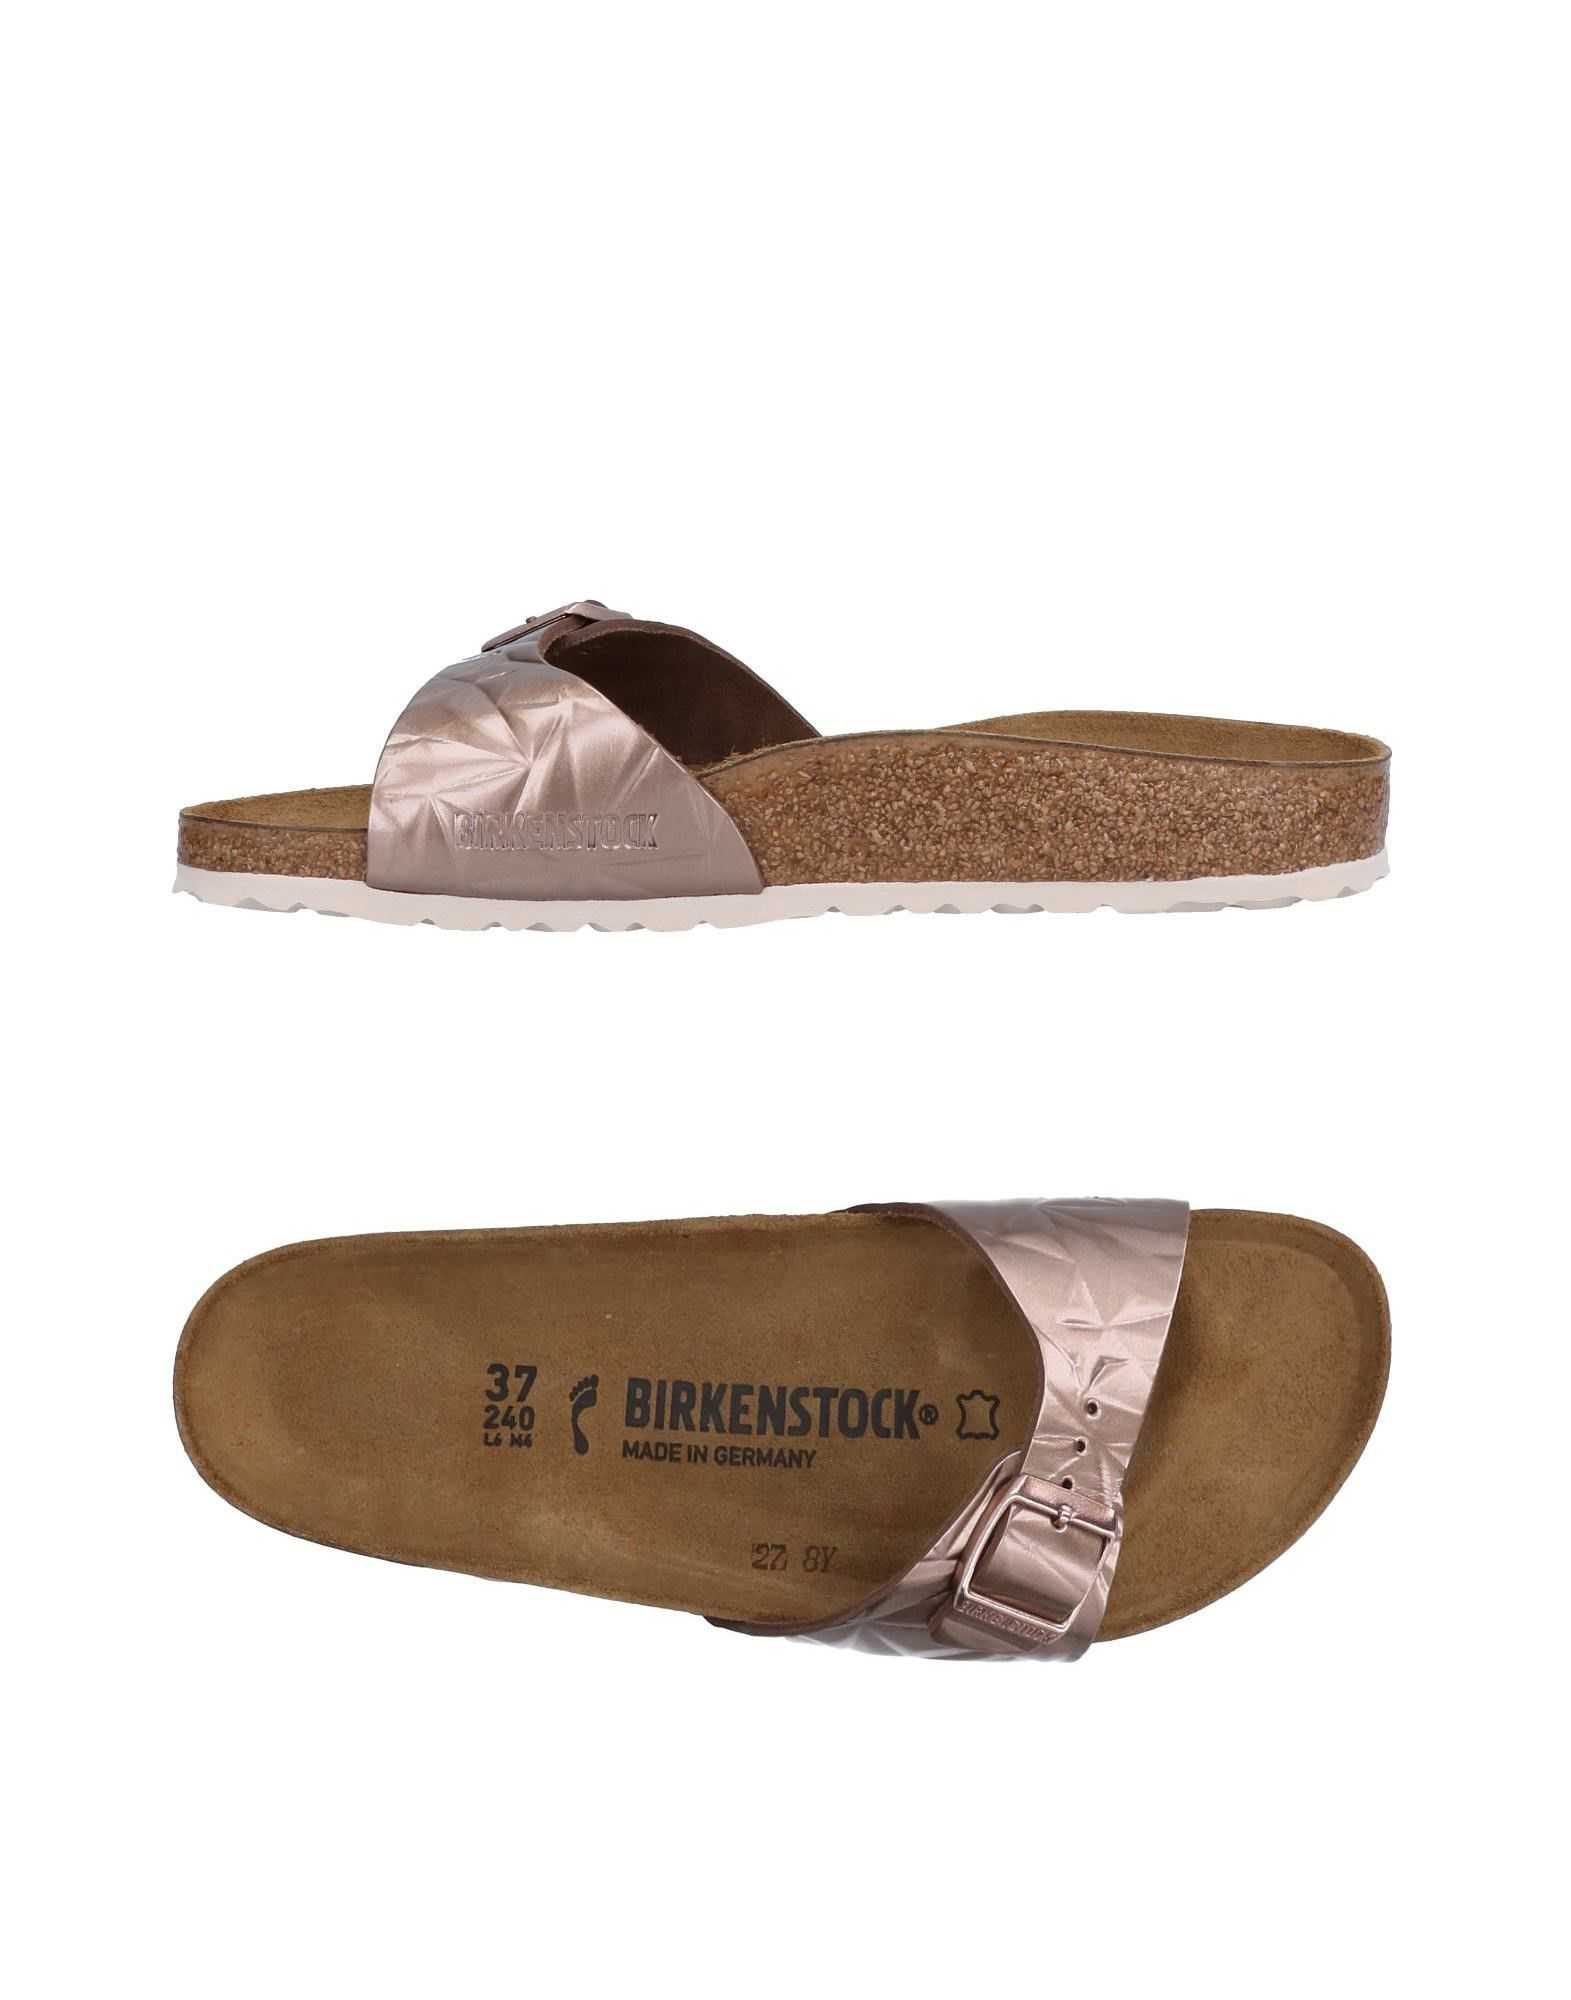 Birkenstock Sandals Sandals - Women Birkenstock Sandals Birkenstock online on  United Kingdom - 11507664NL c53a25